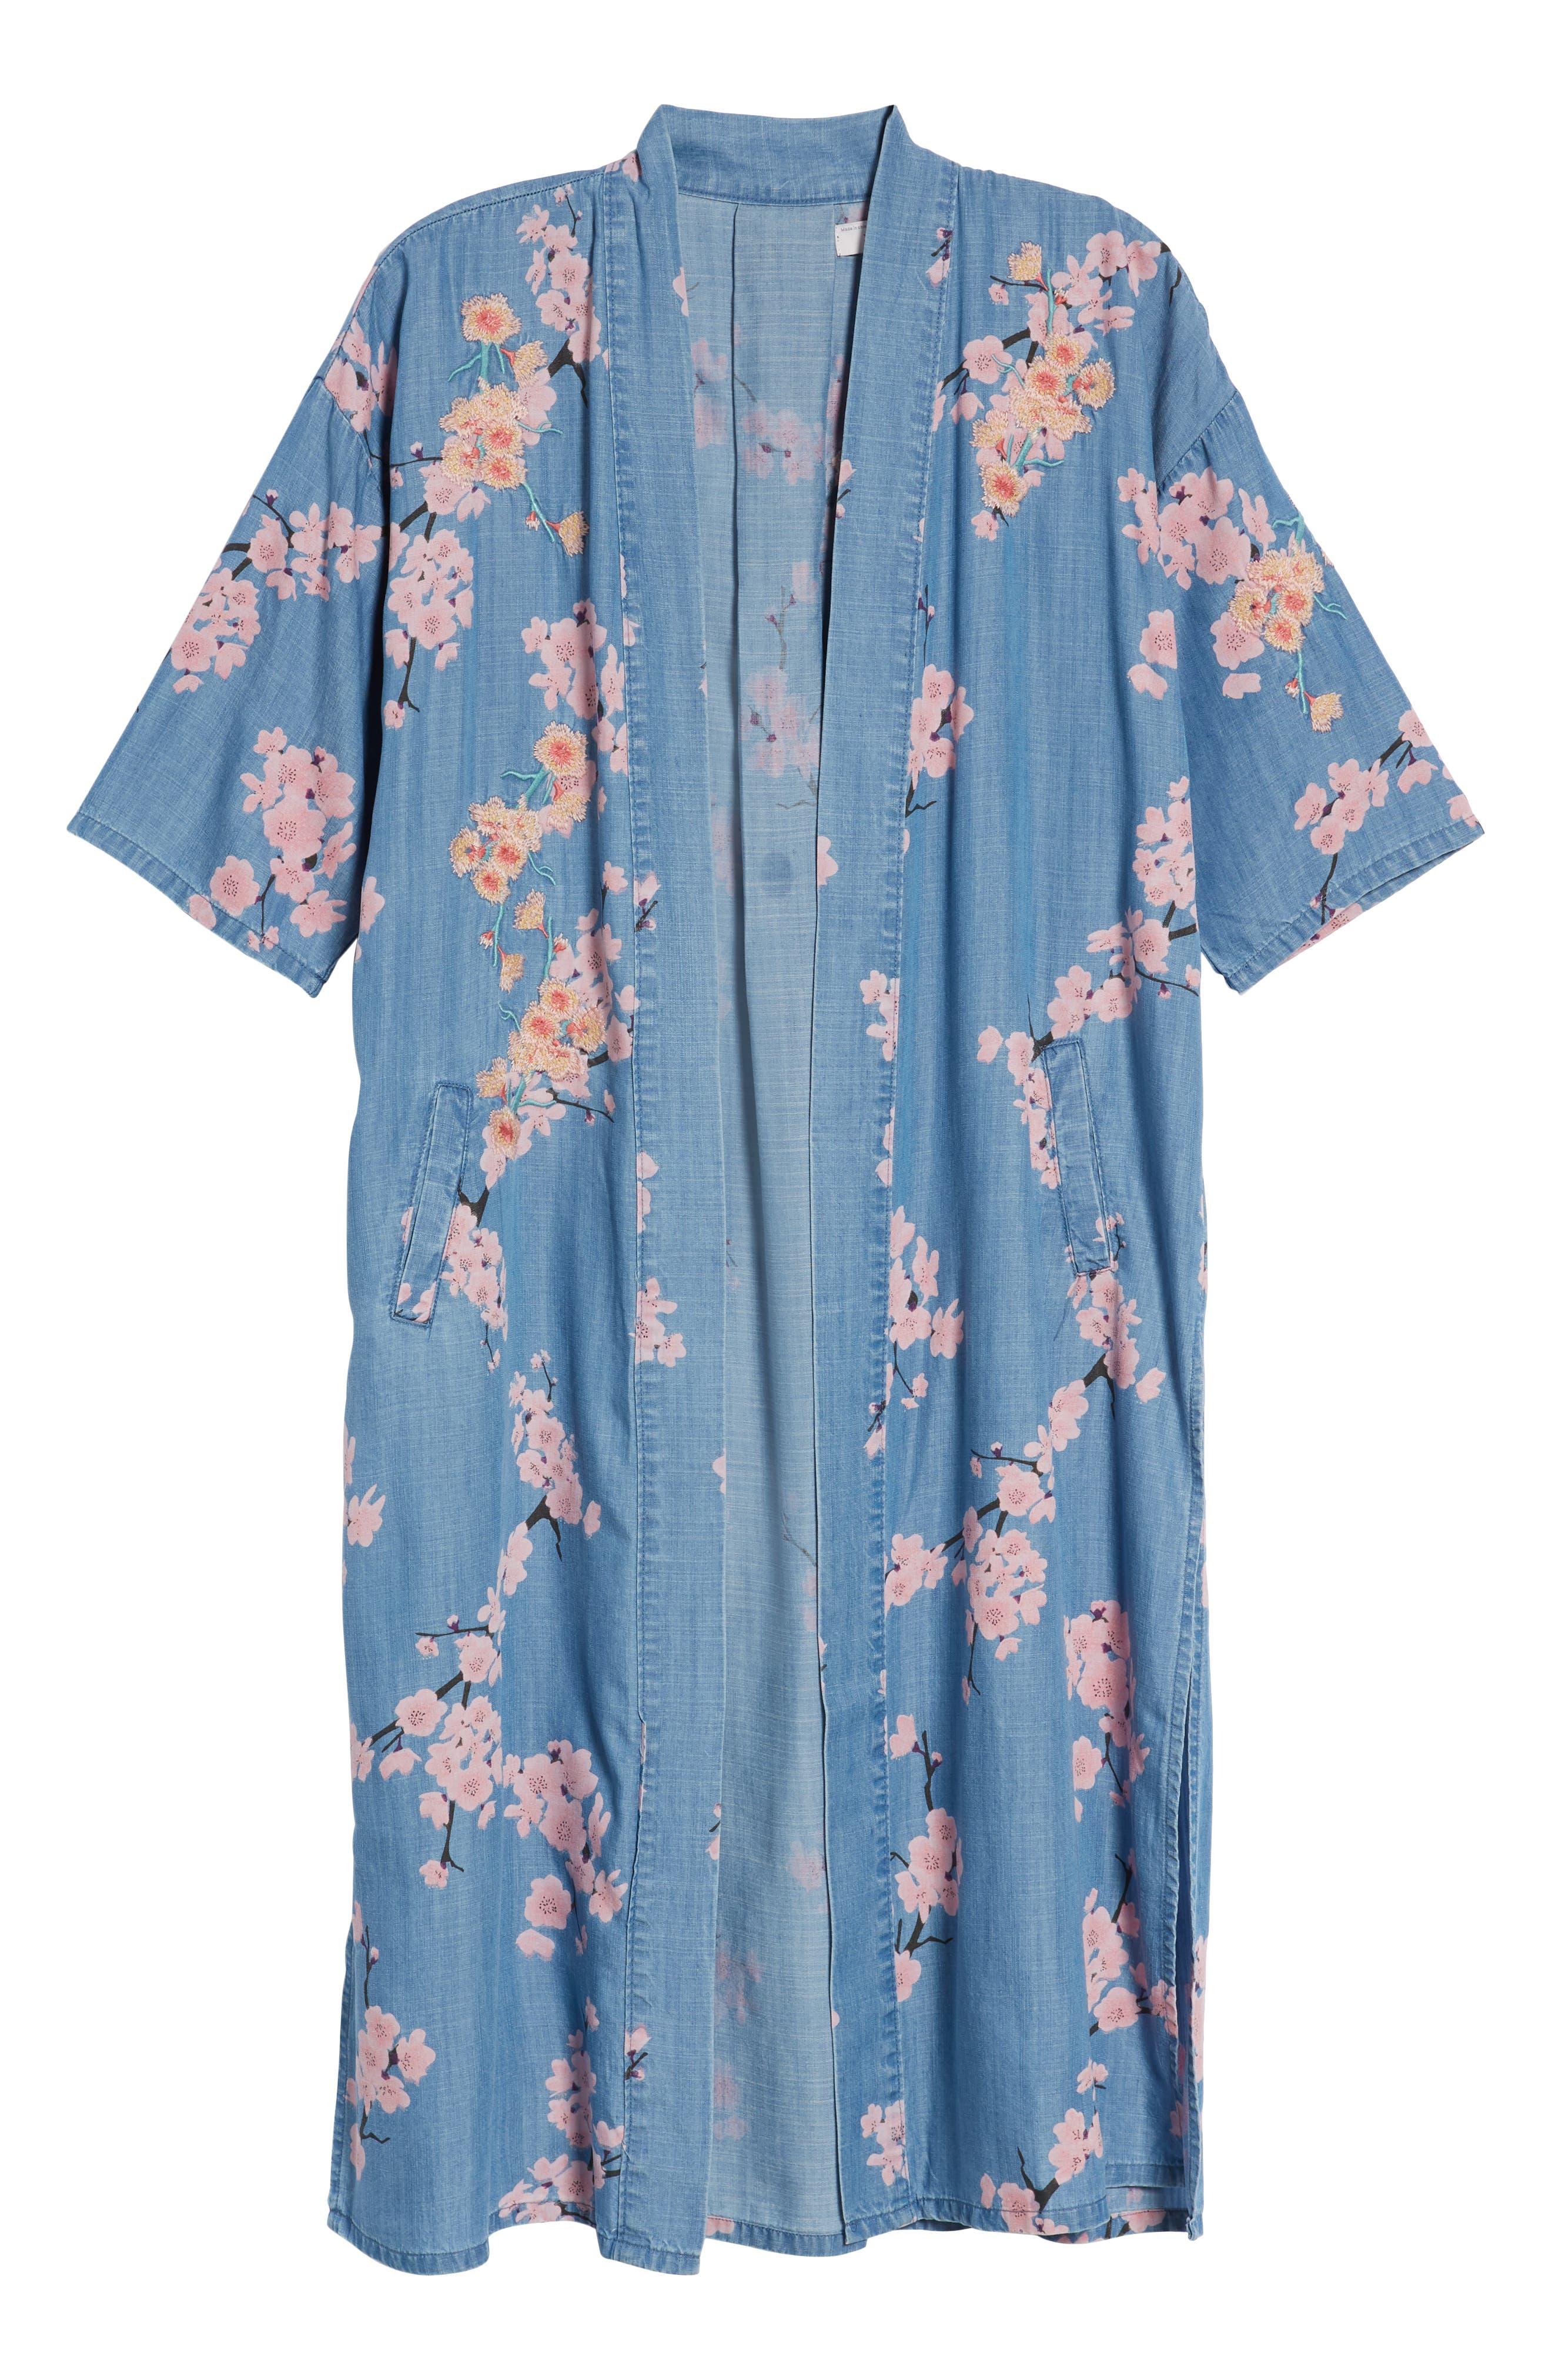 Cherry Blossom Kimono,                             Alternate thumbnail 7, color,                             Blue Cherry Blossom